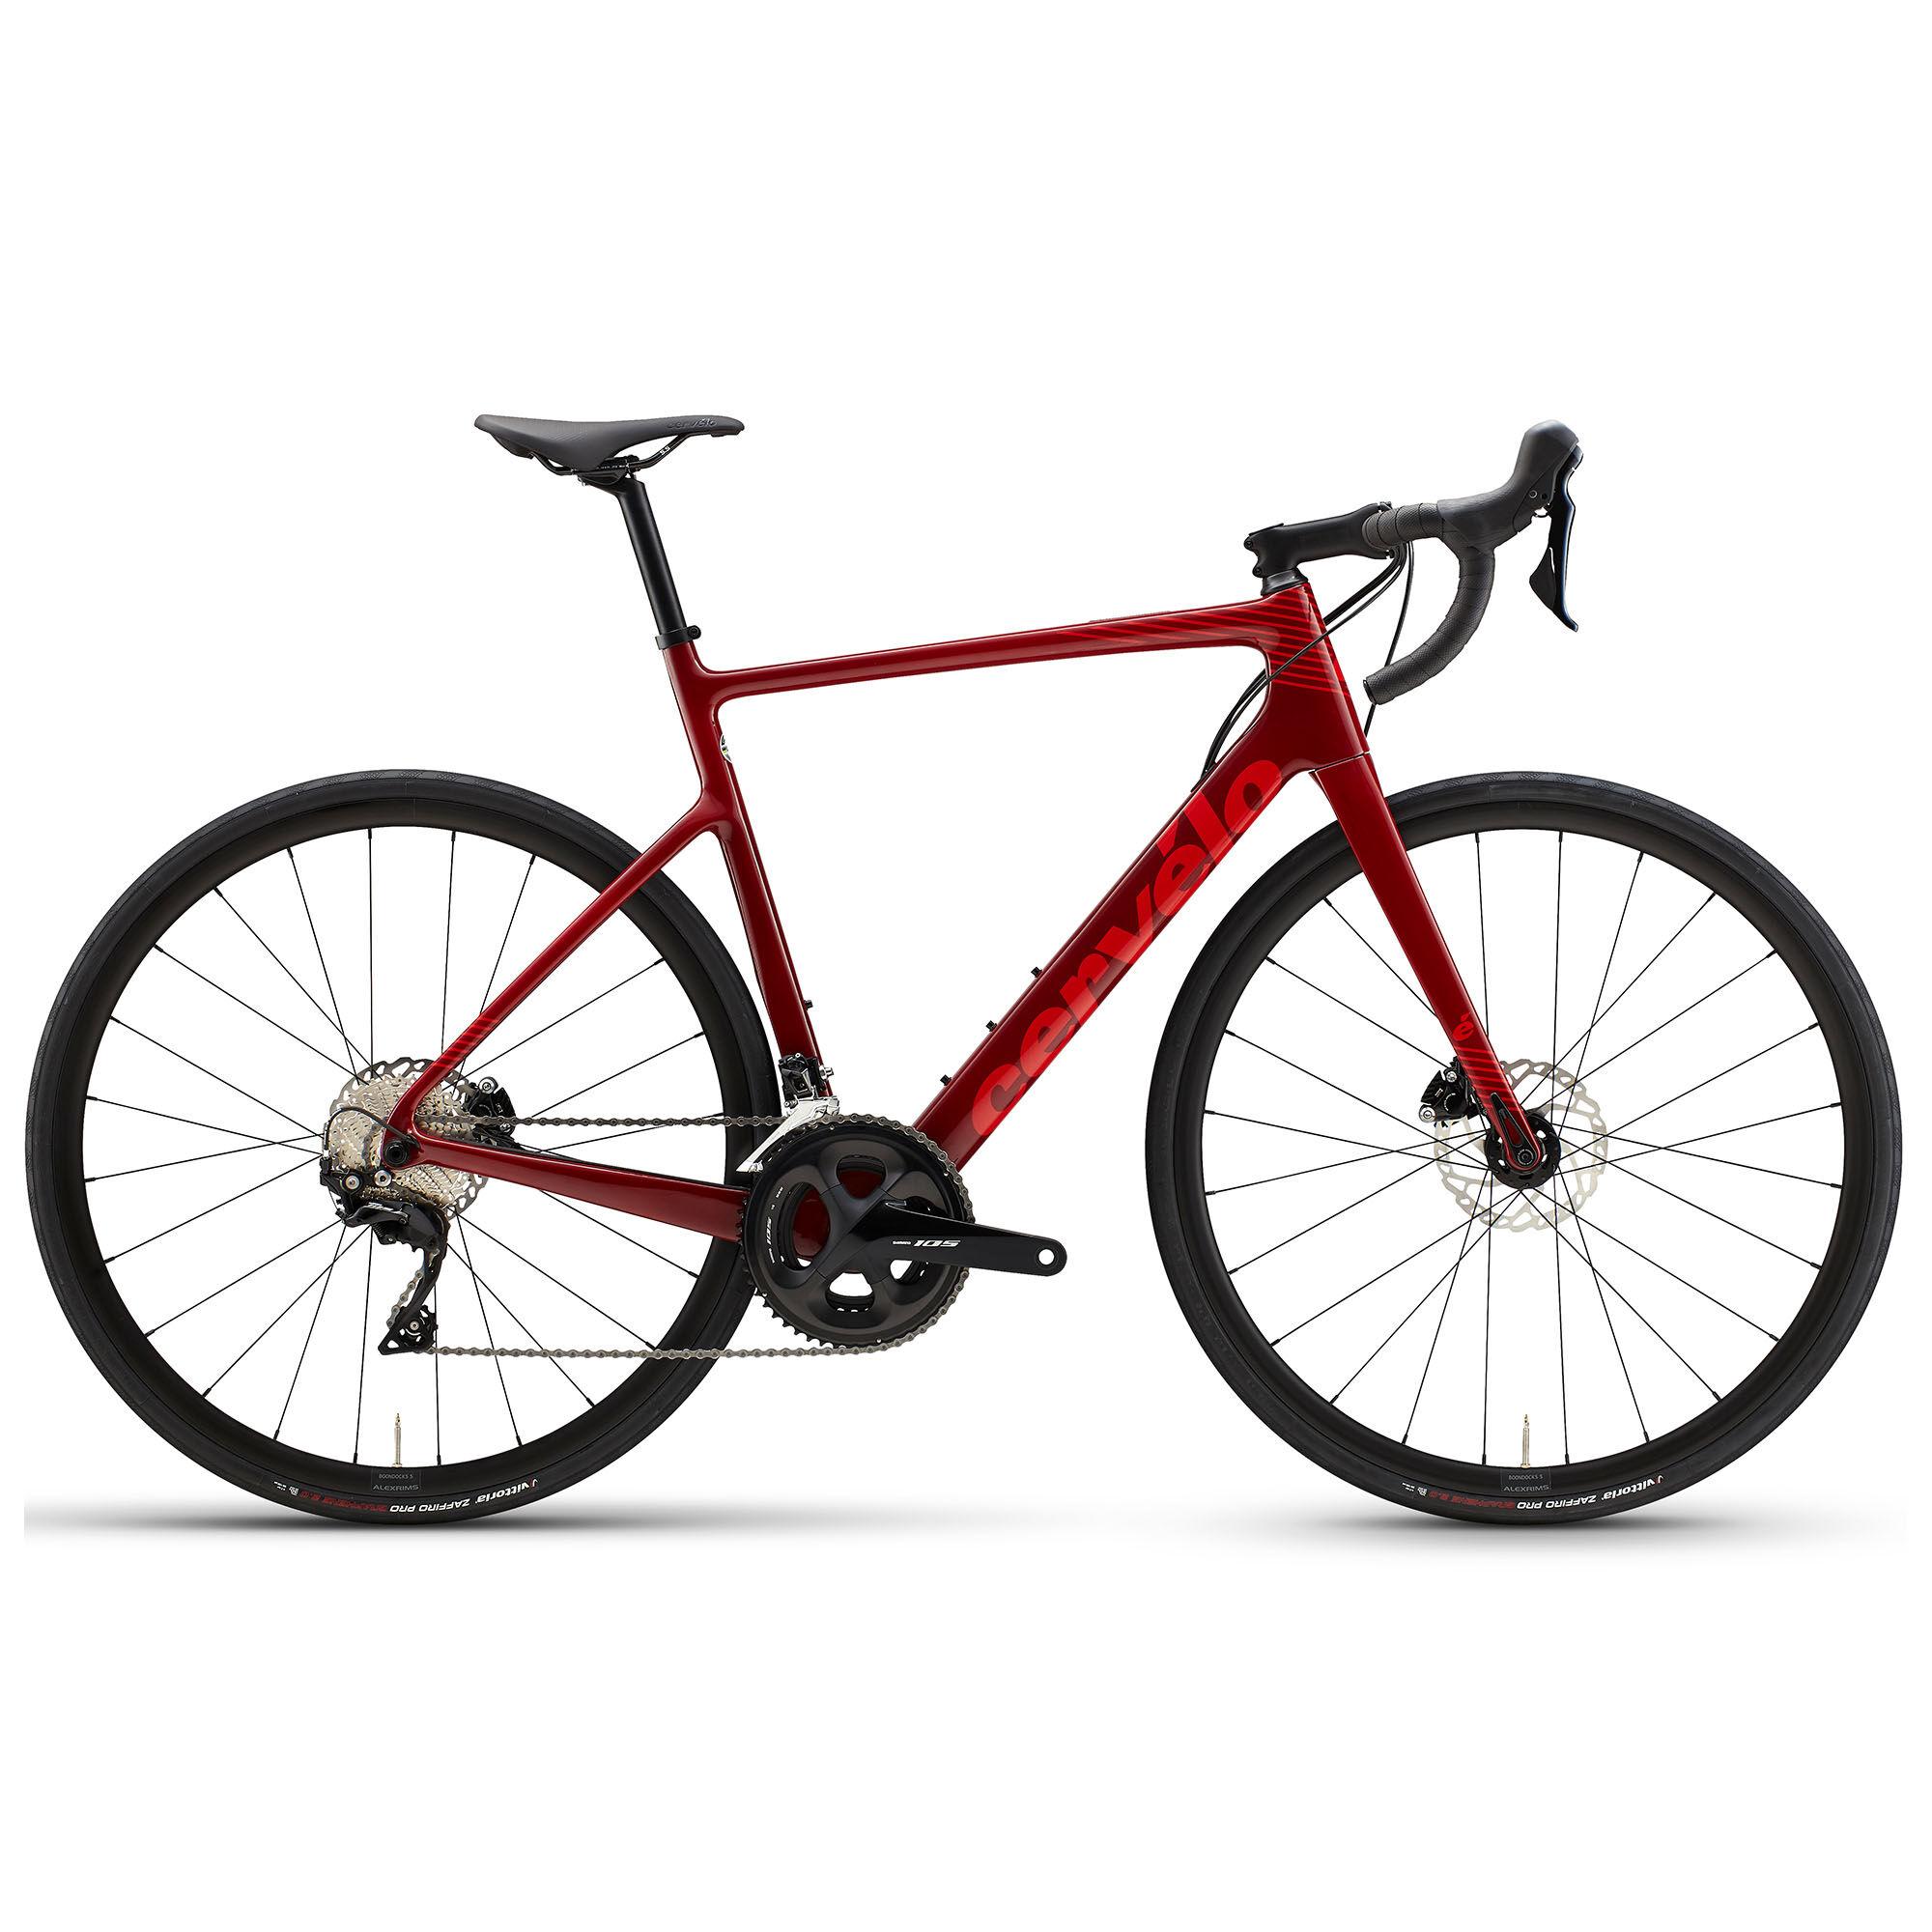 Cervelo Men's Caledonia 105 Road Bike '21  - Maroon/Red - Size: 56